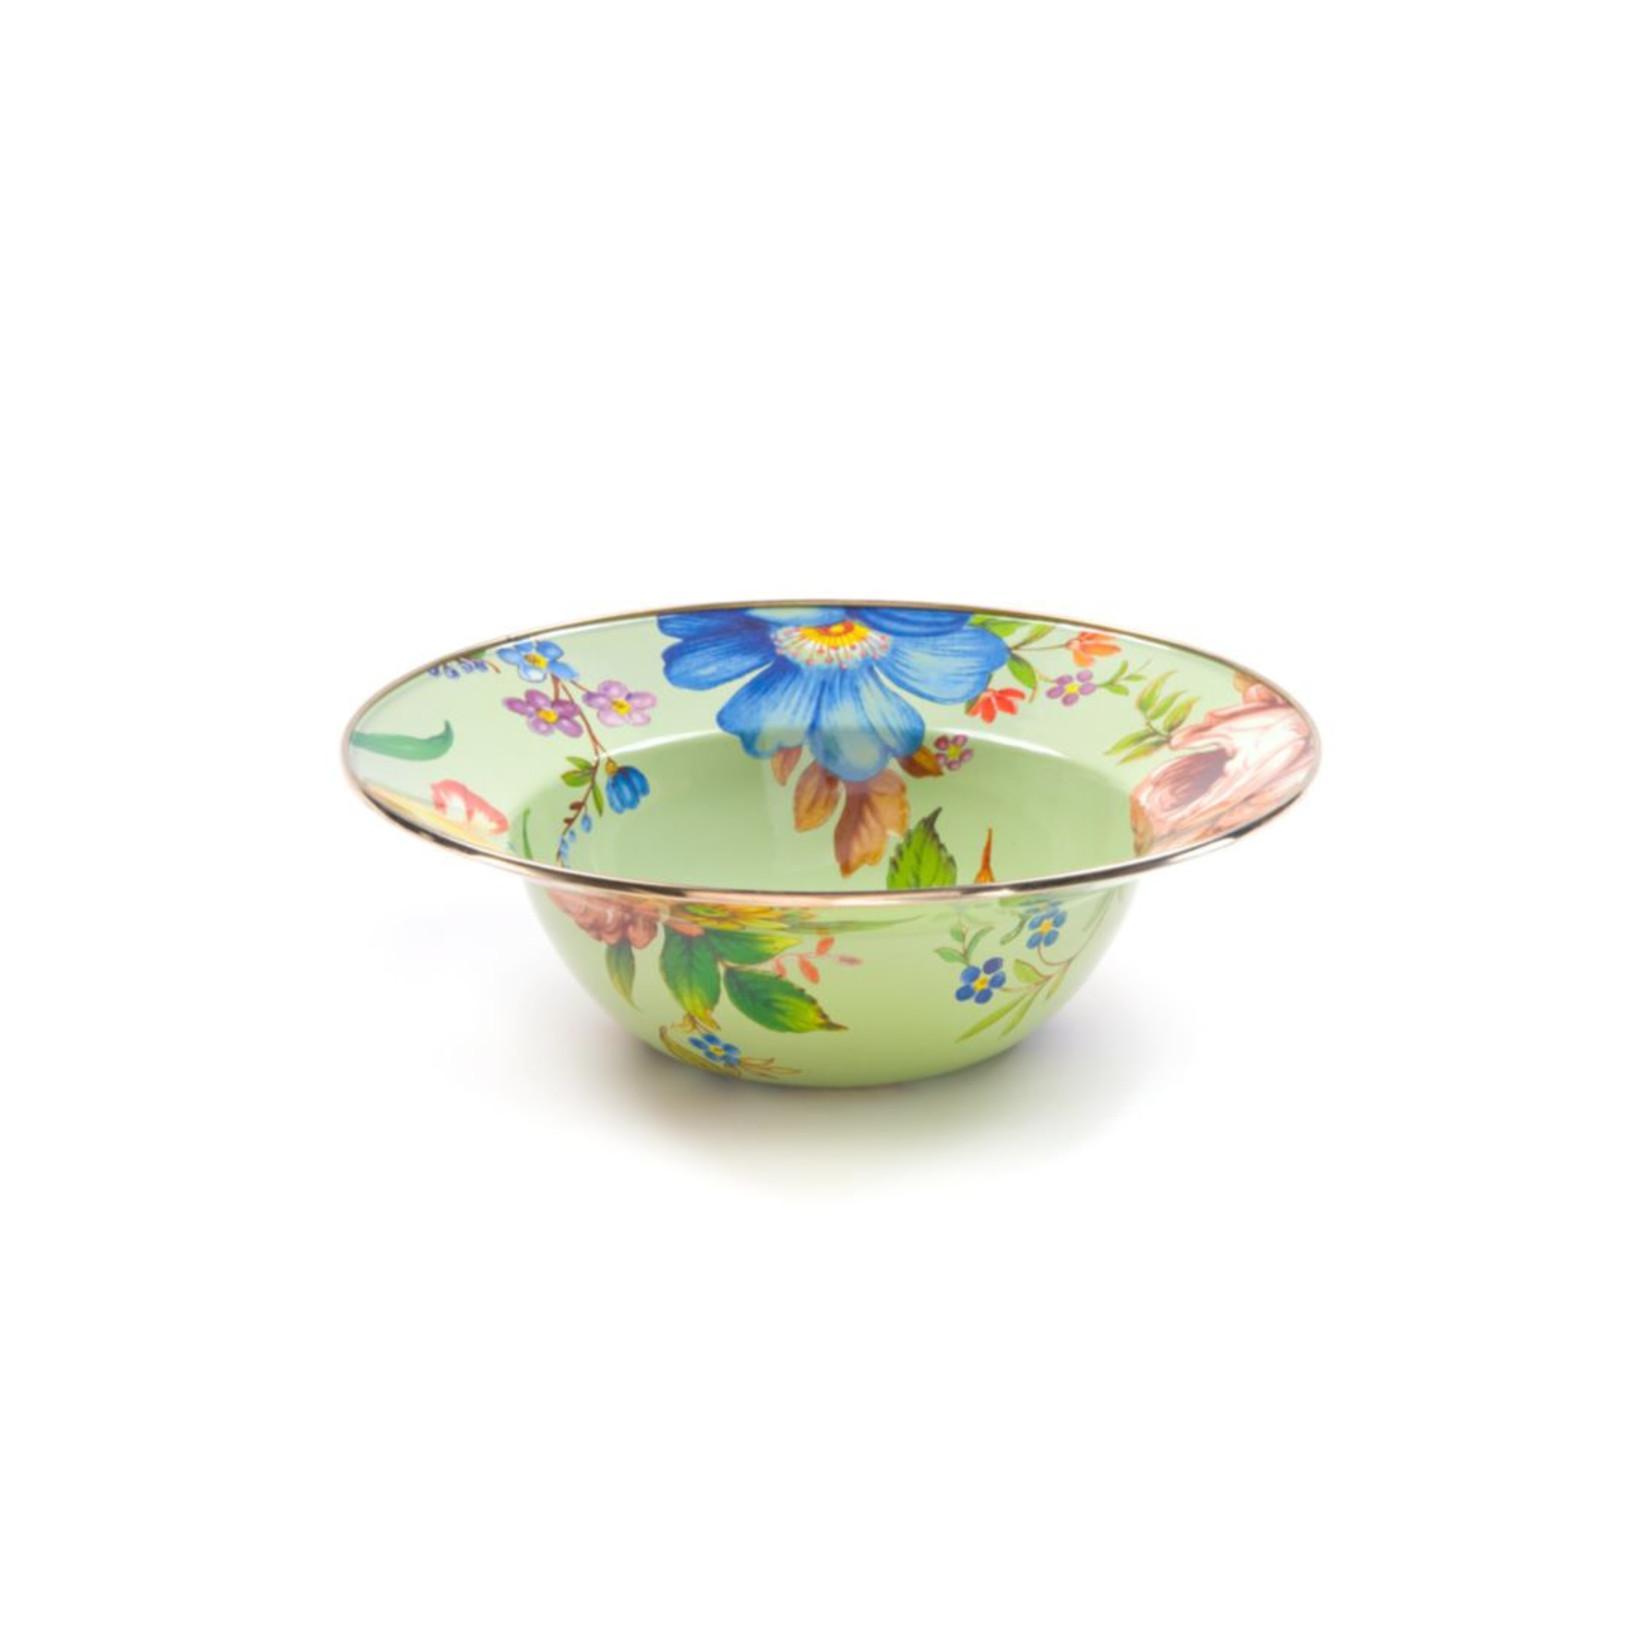 MacKenzie Childs Flower market Serving Bowl - Green